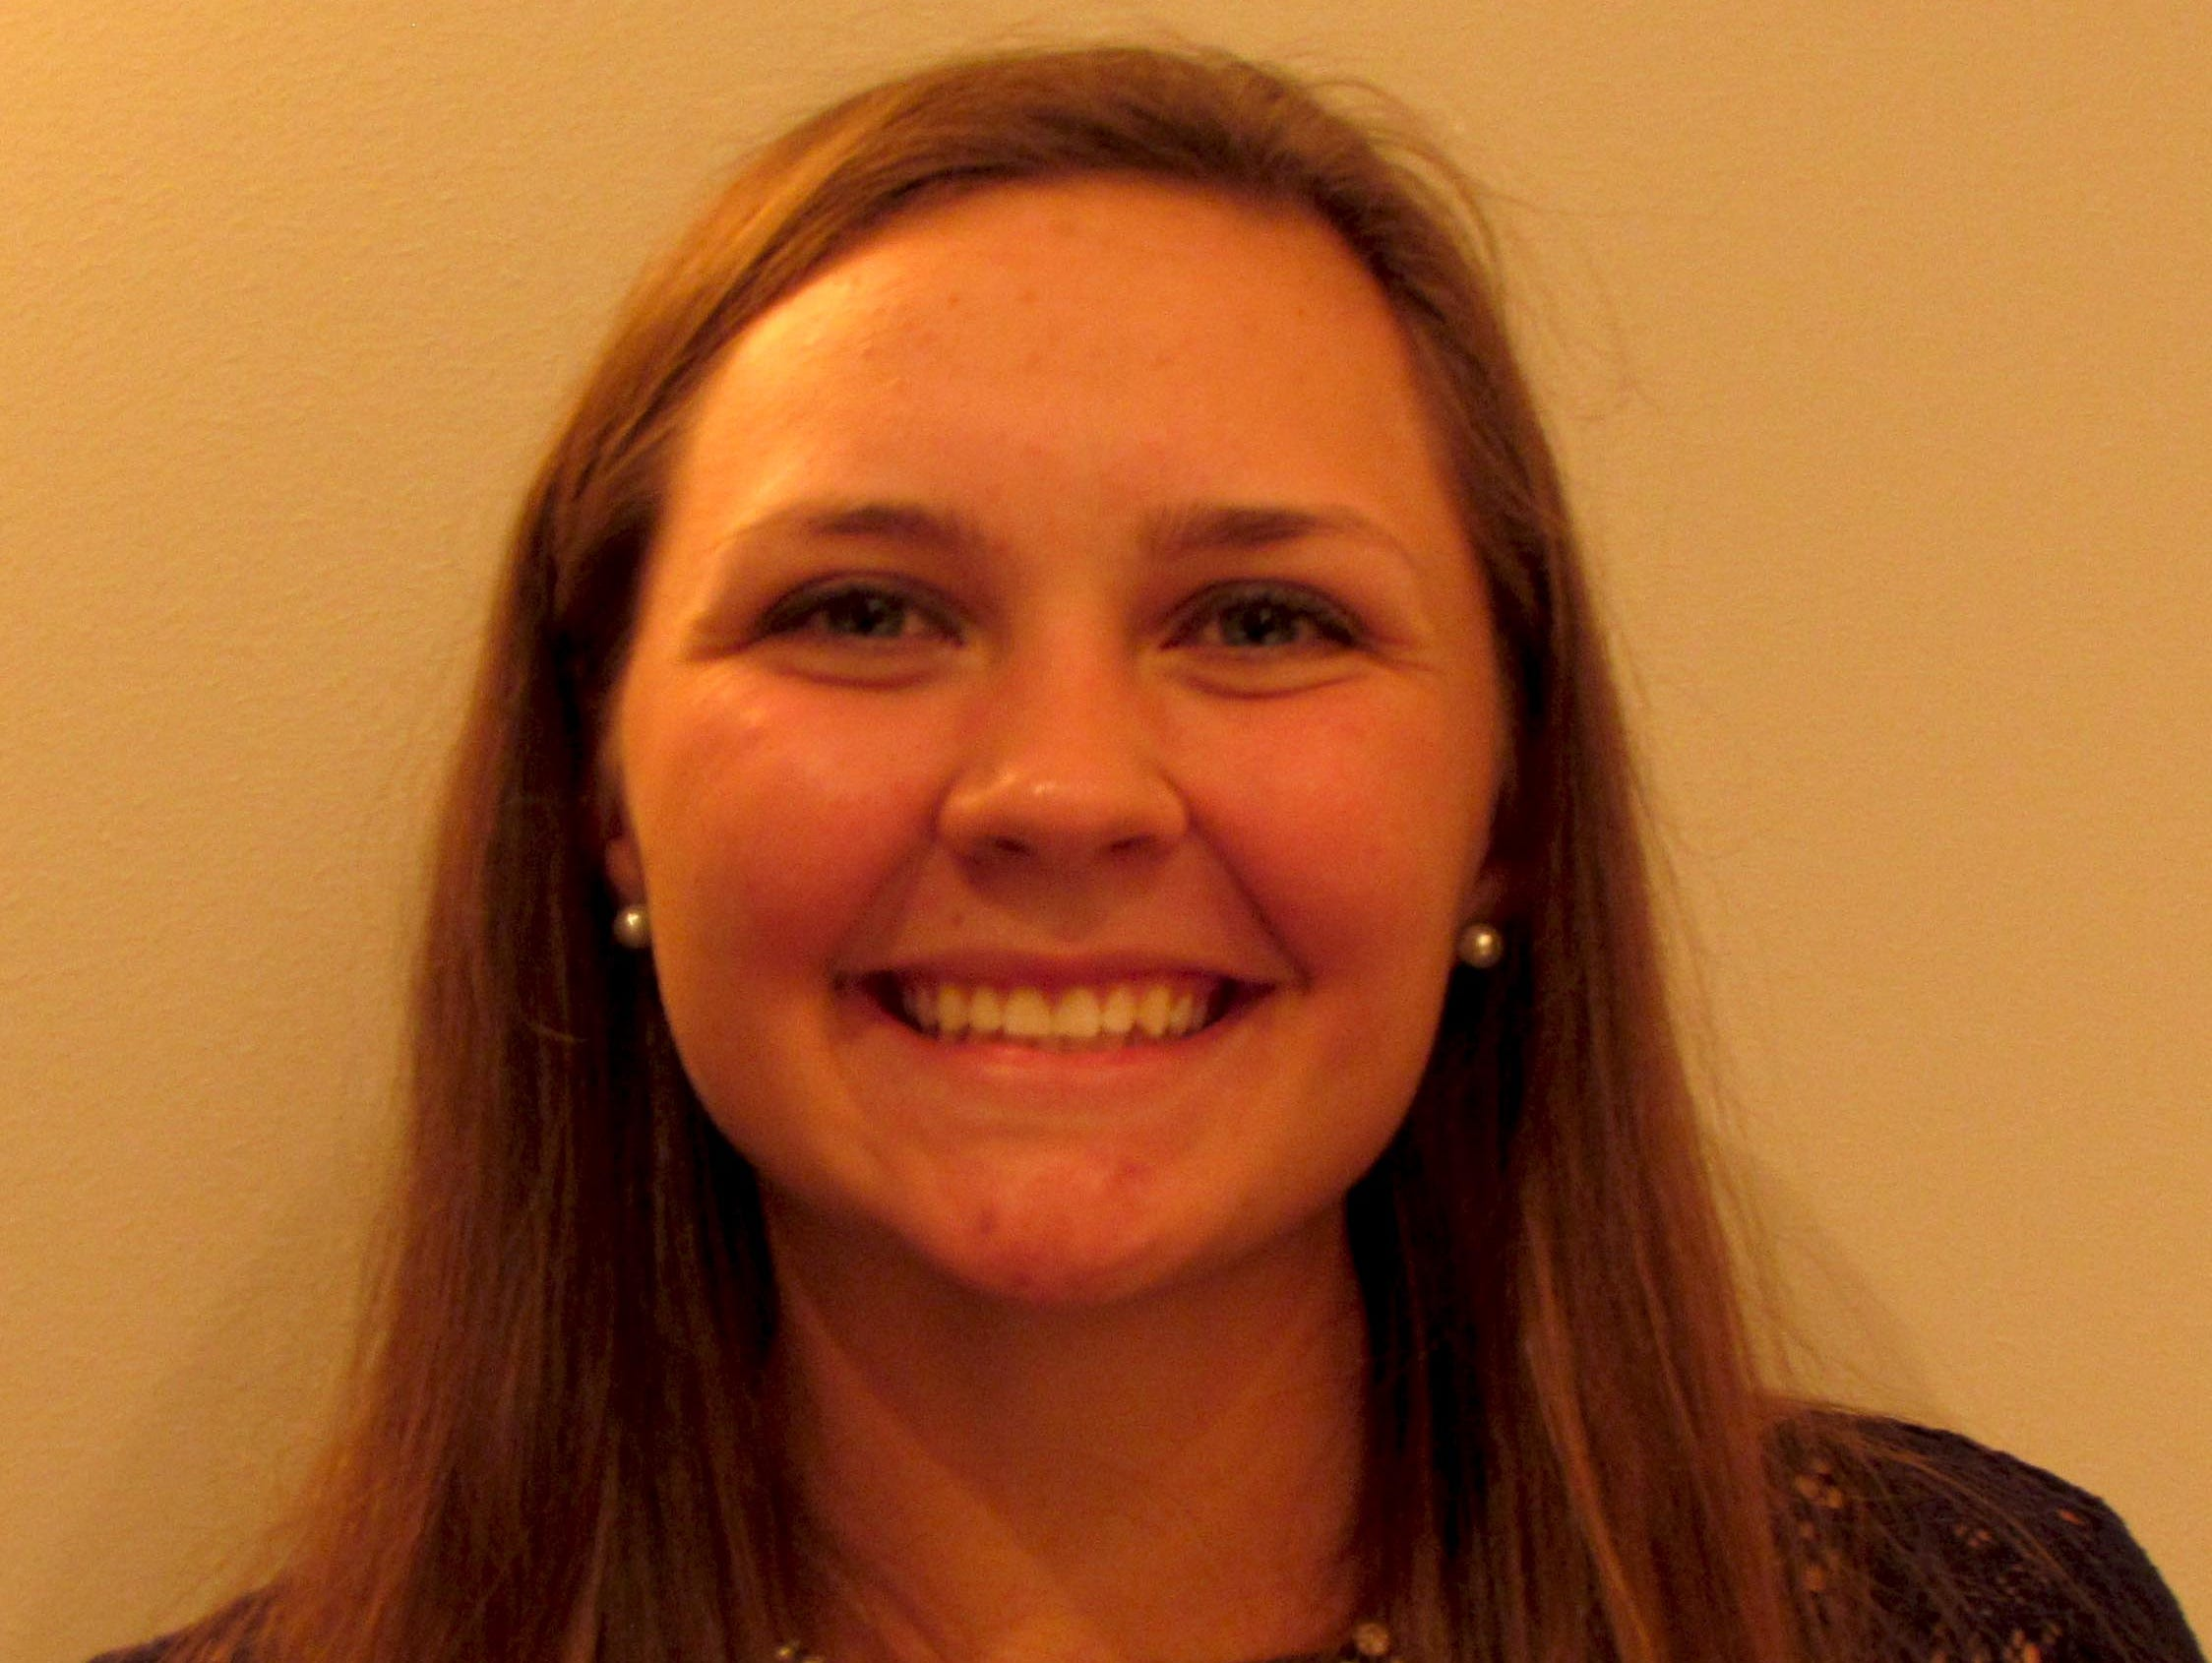 Bloomington South golfer Cherise Otter